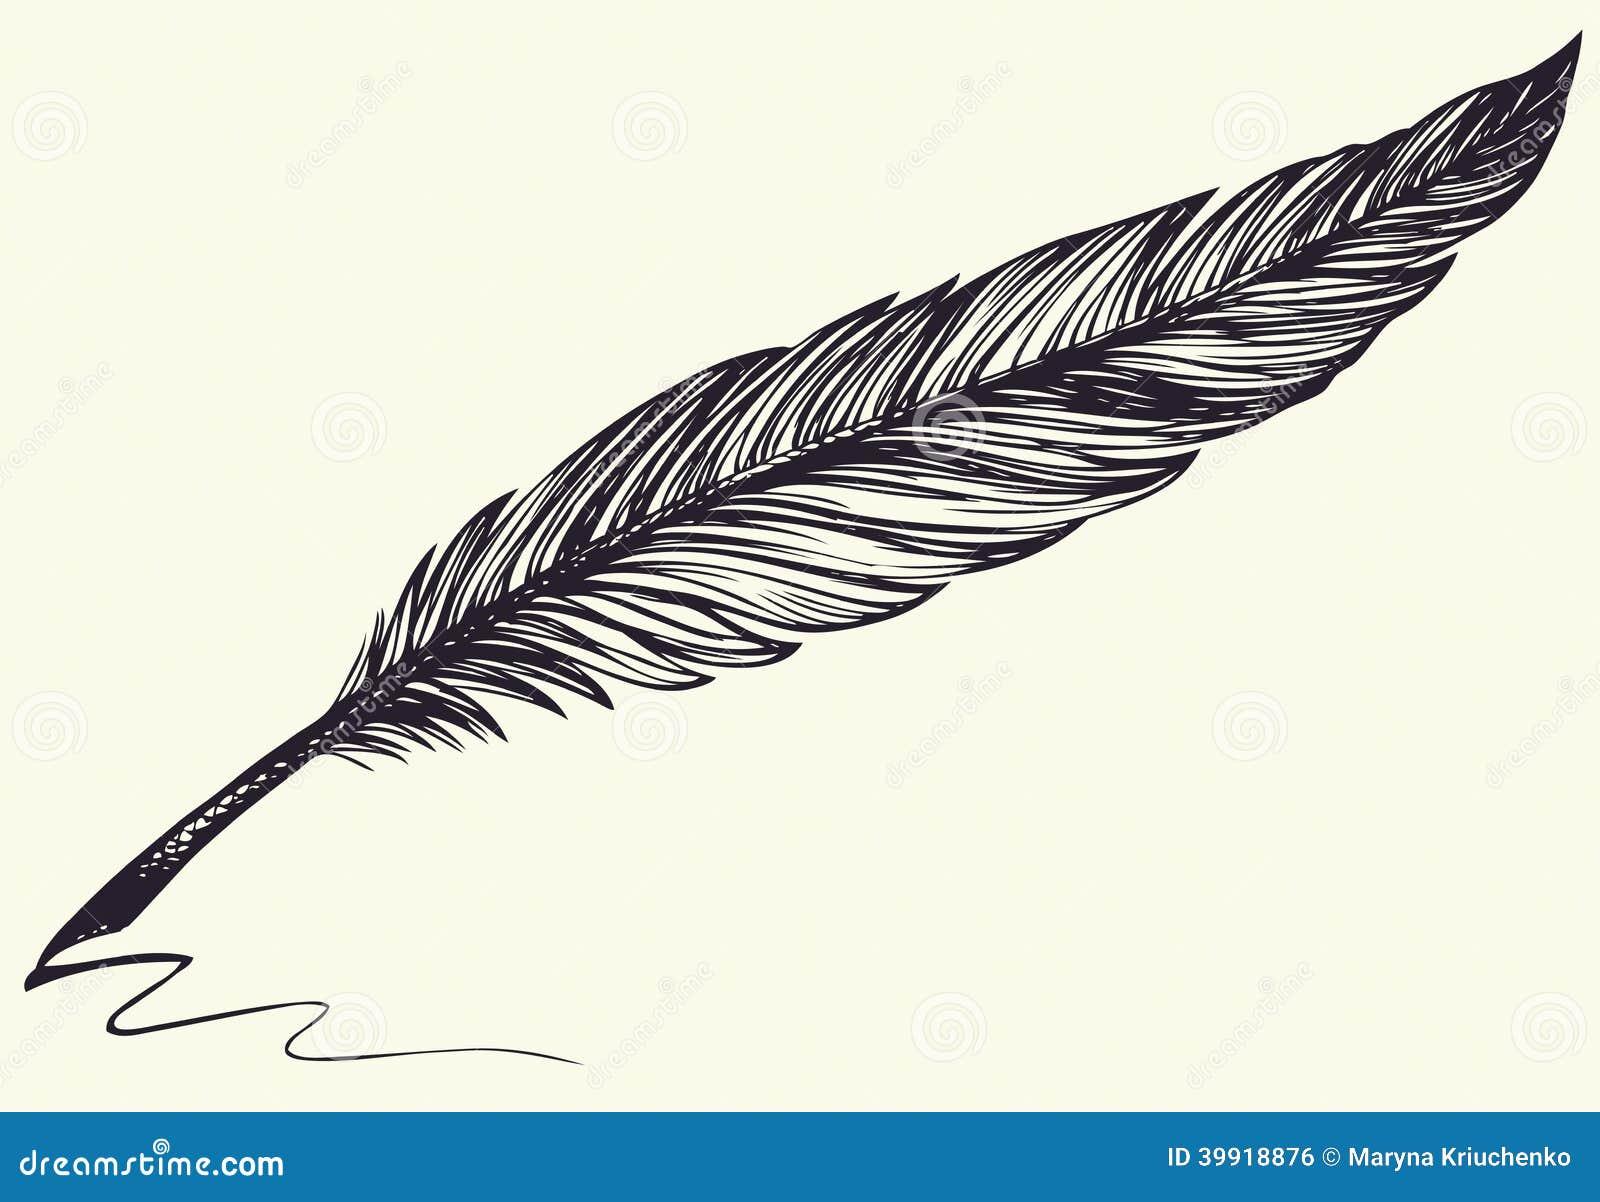 Dibujo A Pulso Del Vector De La Pluma De Pájaro Oscura